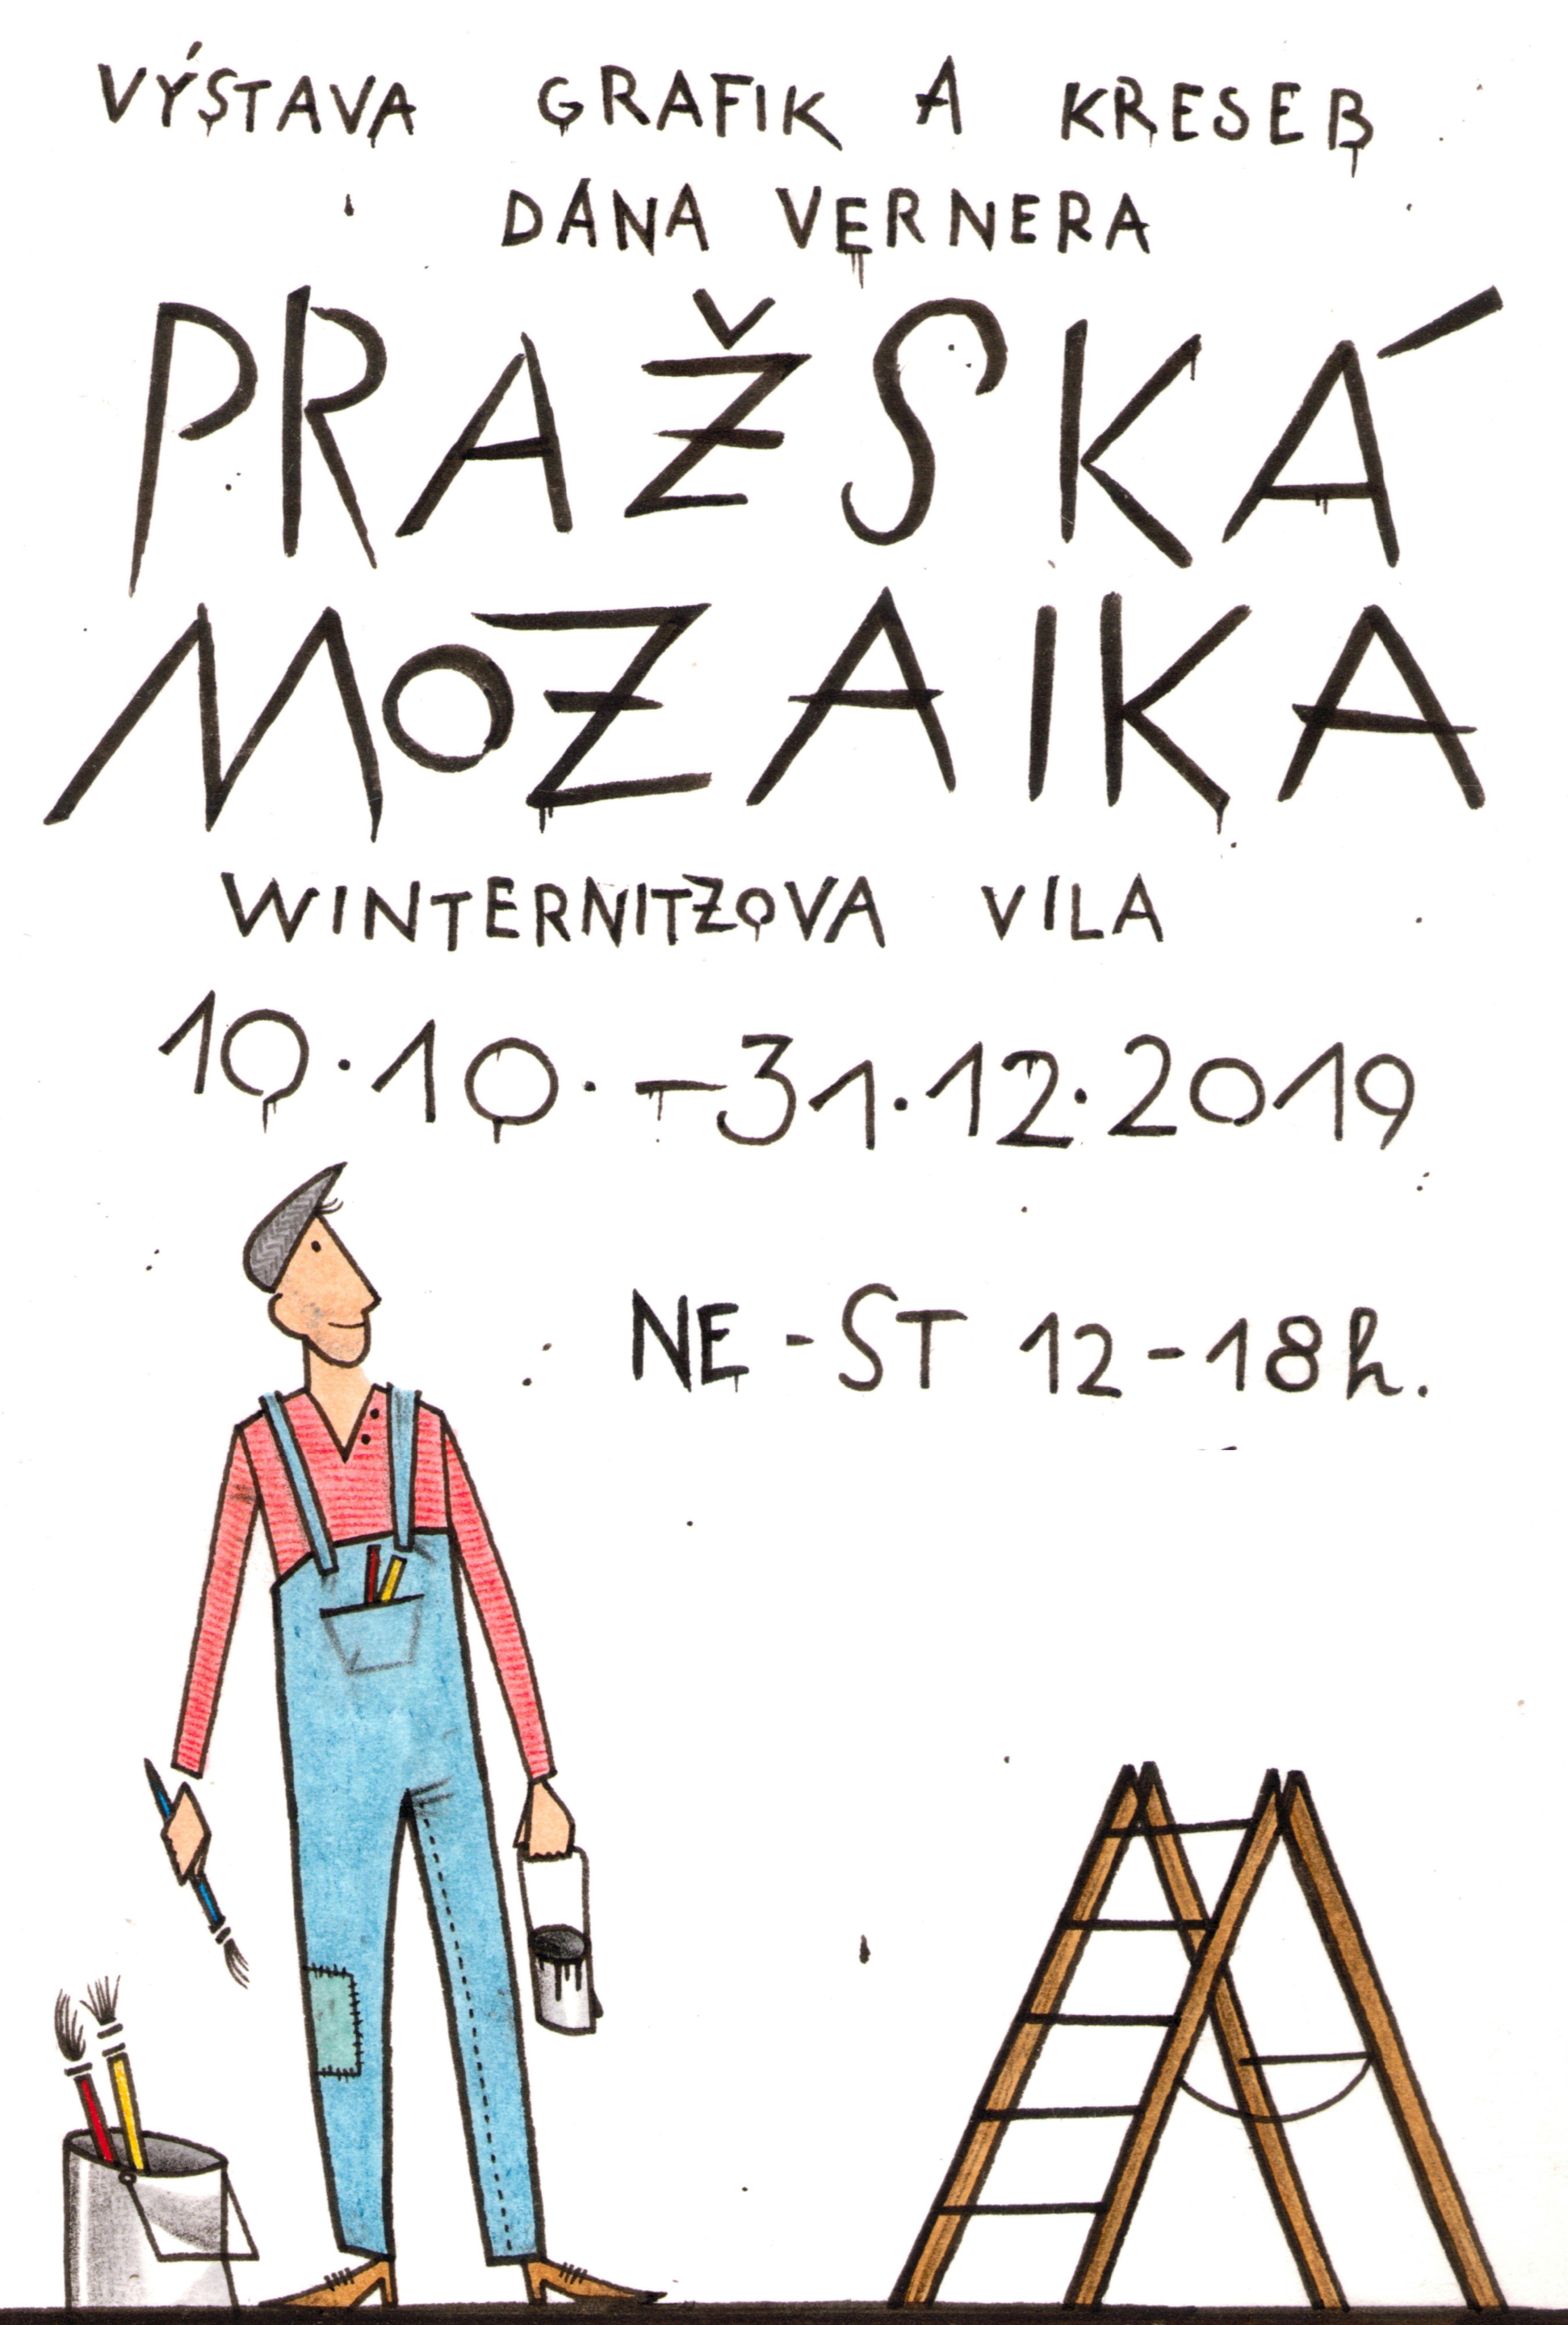 vernisaz-vystavy-kreseb-a-grafik-daniela-vernera-prazska-mozaika